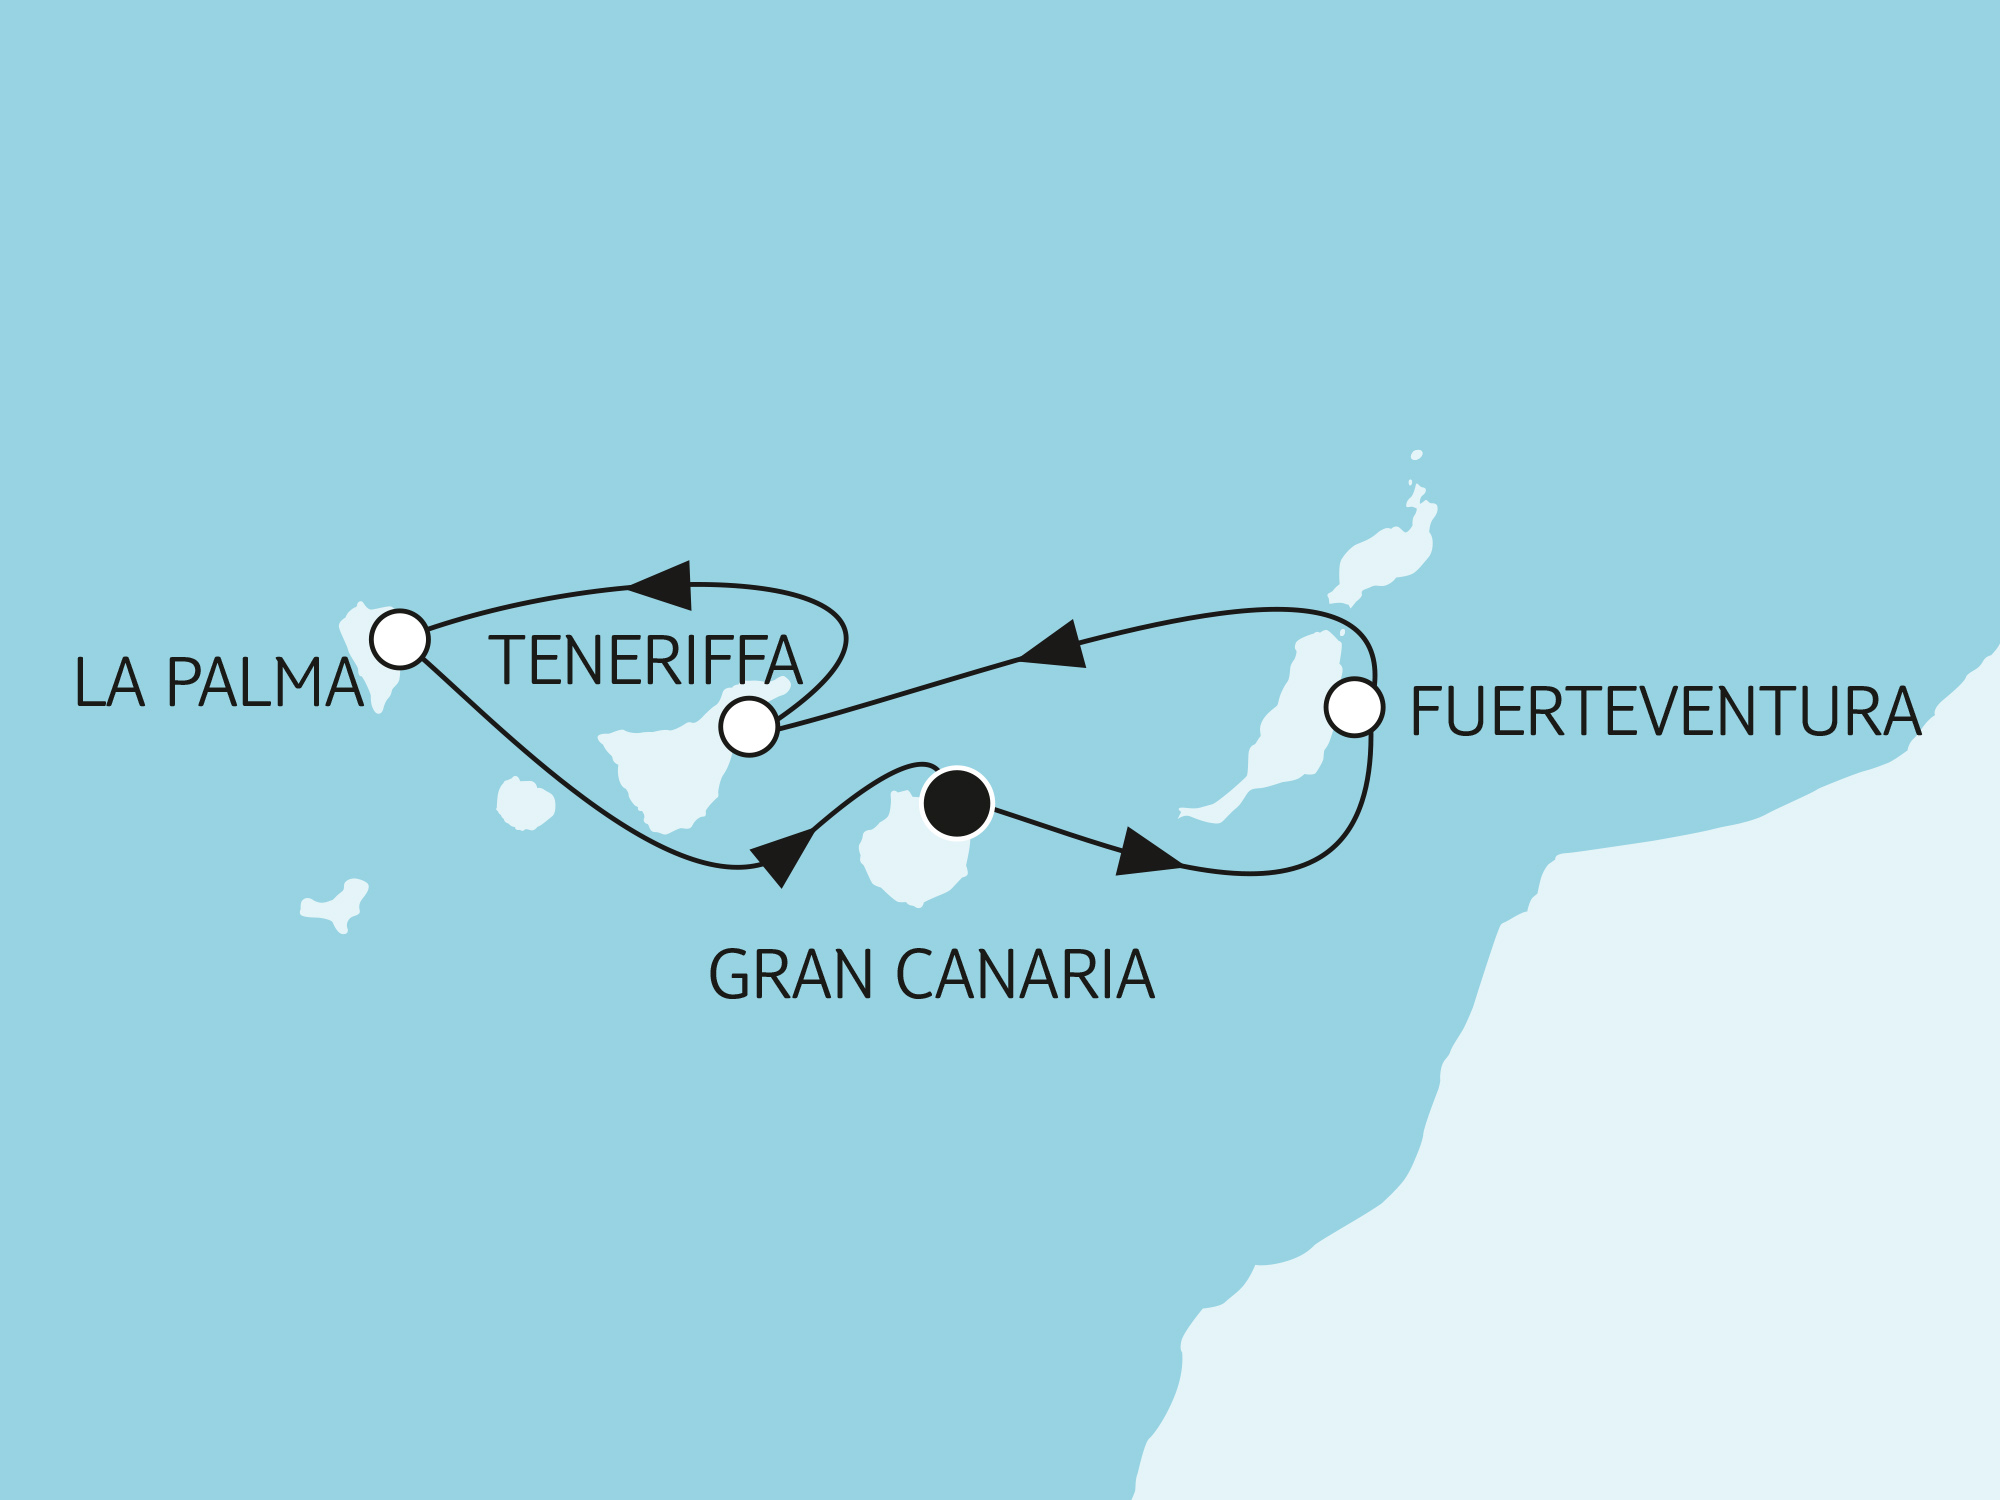 TUI Cruises last minute, Mein Schiff last minute, corona Kreuzfahrt möglich, lockdown kreuzfahrt möglich